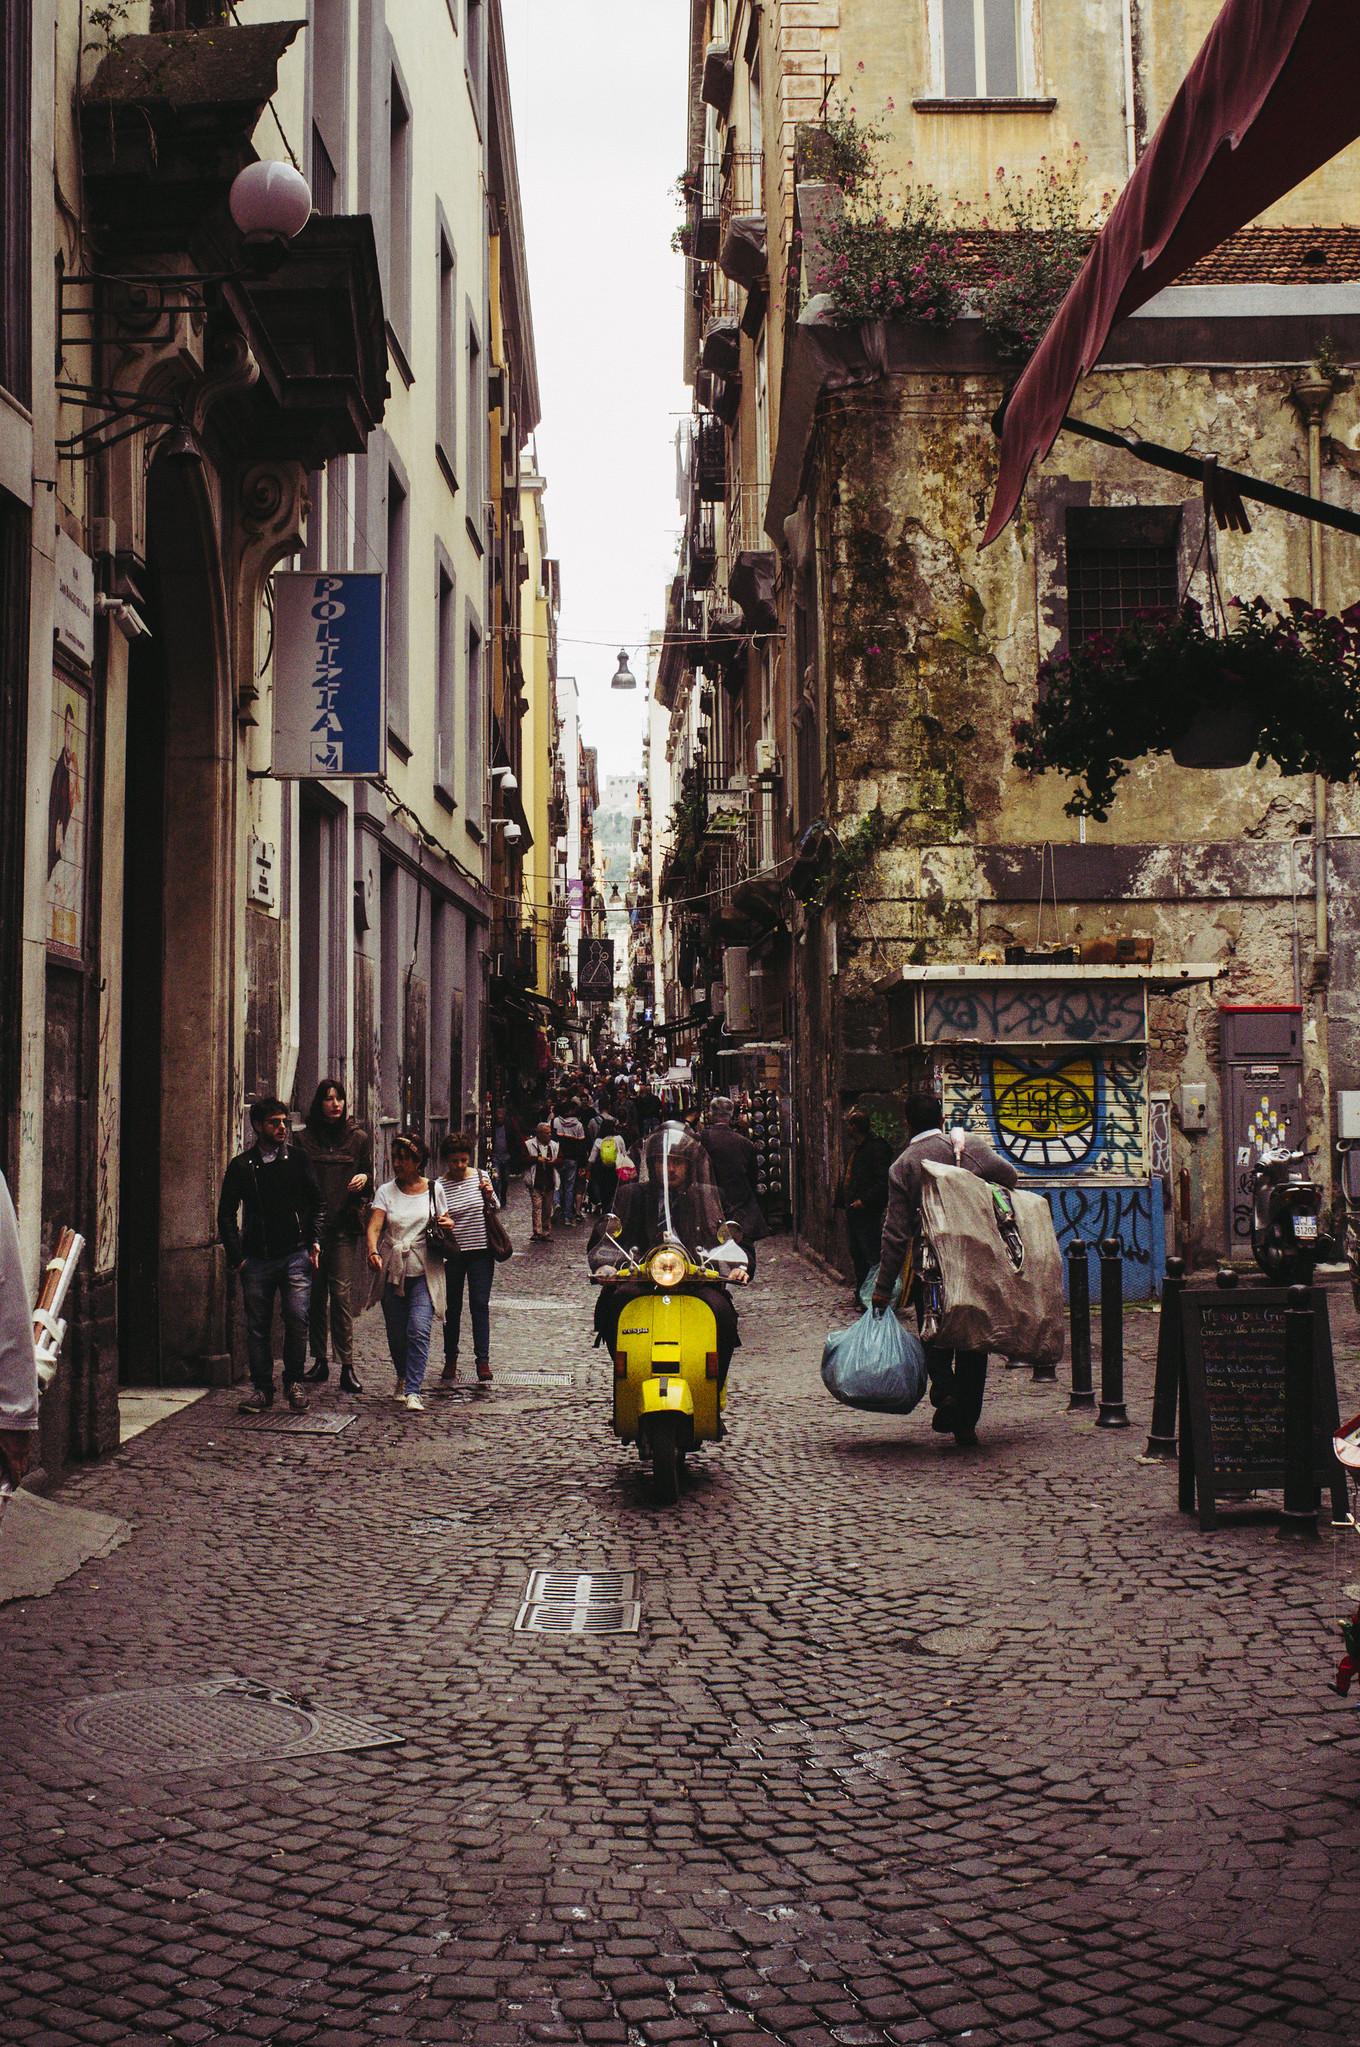 Napoli - Centro Storico